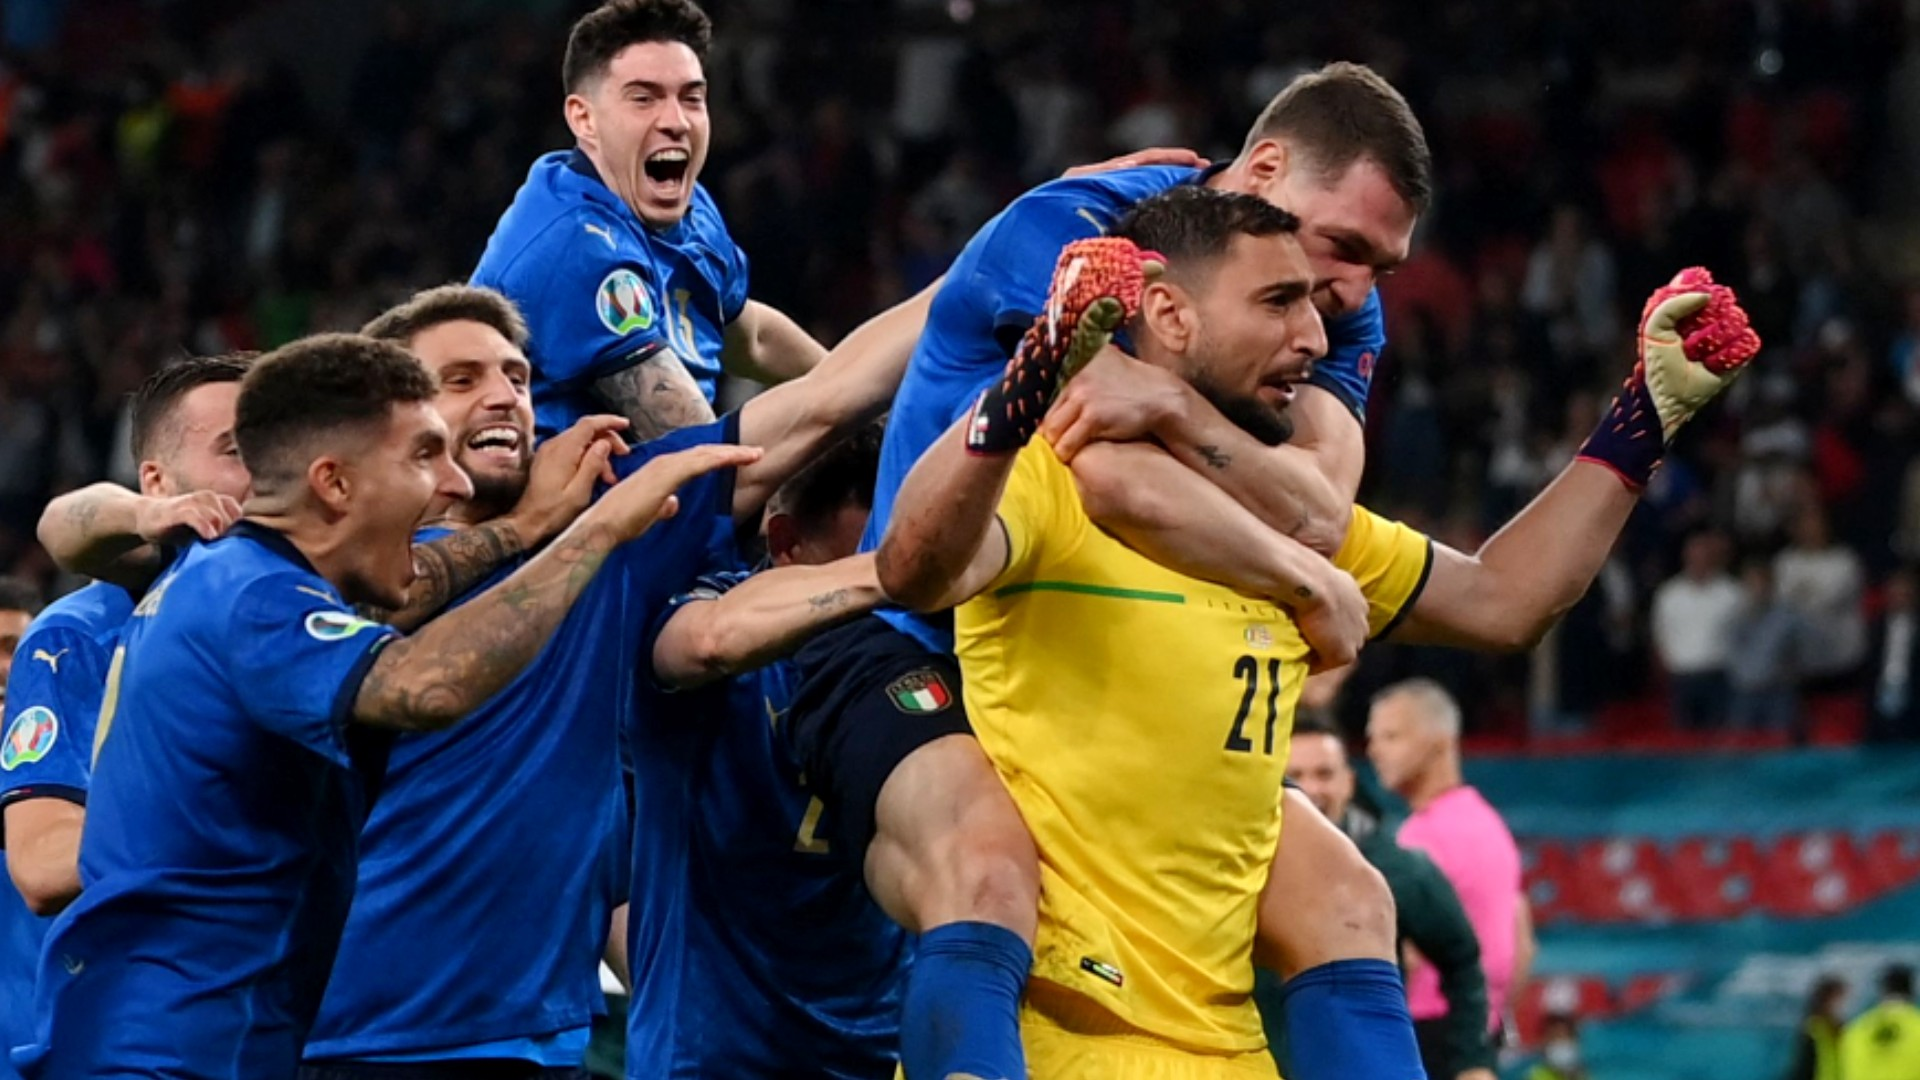 England vs. Italy result: Italians beat English in Euro 2021 final in penalty kick shootout